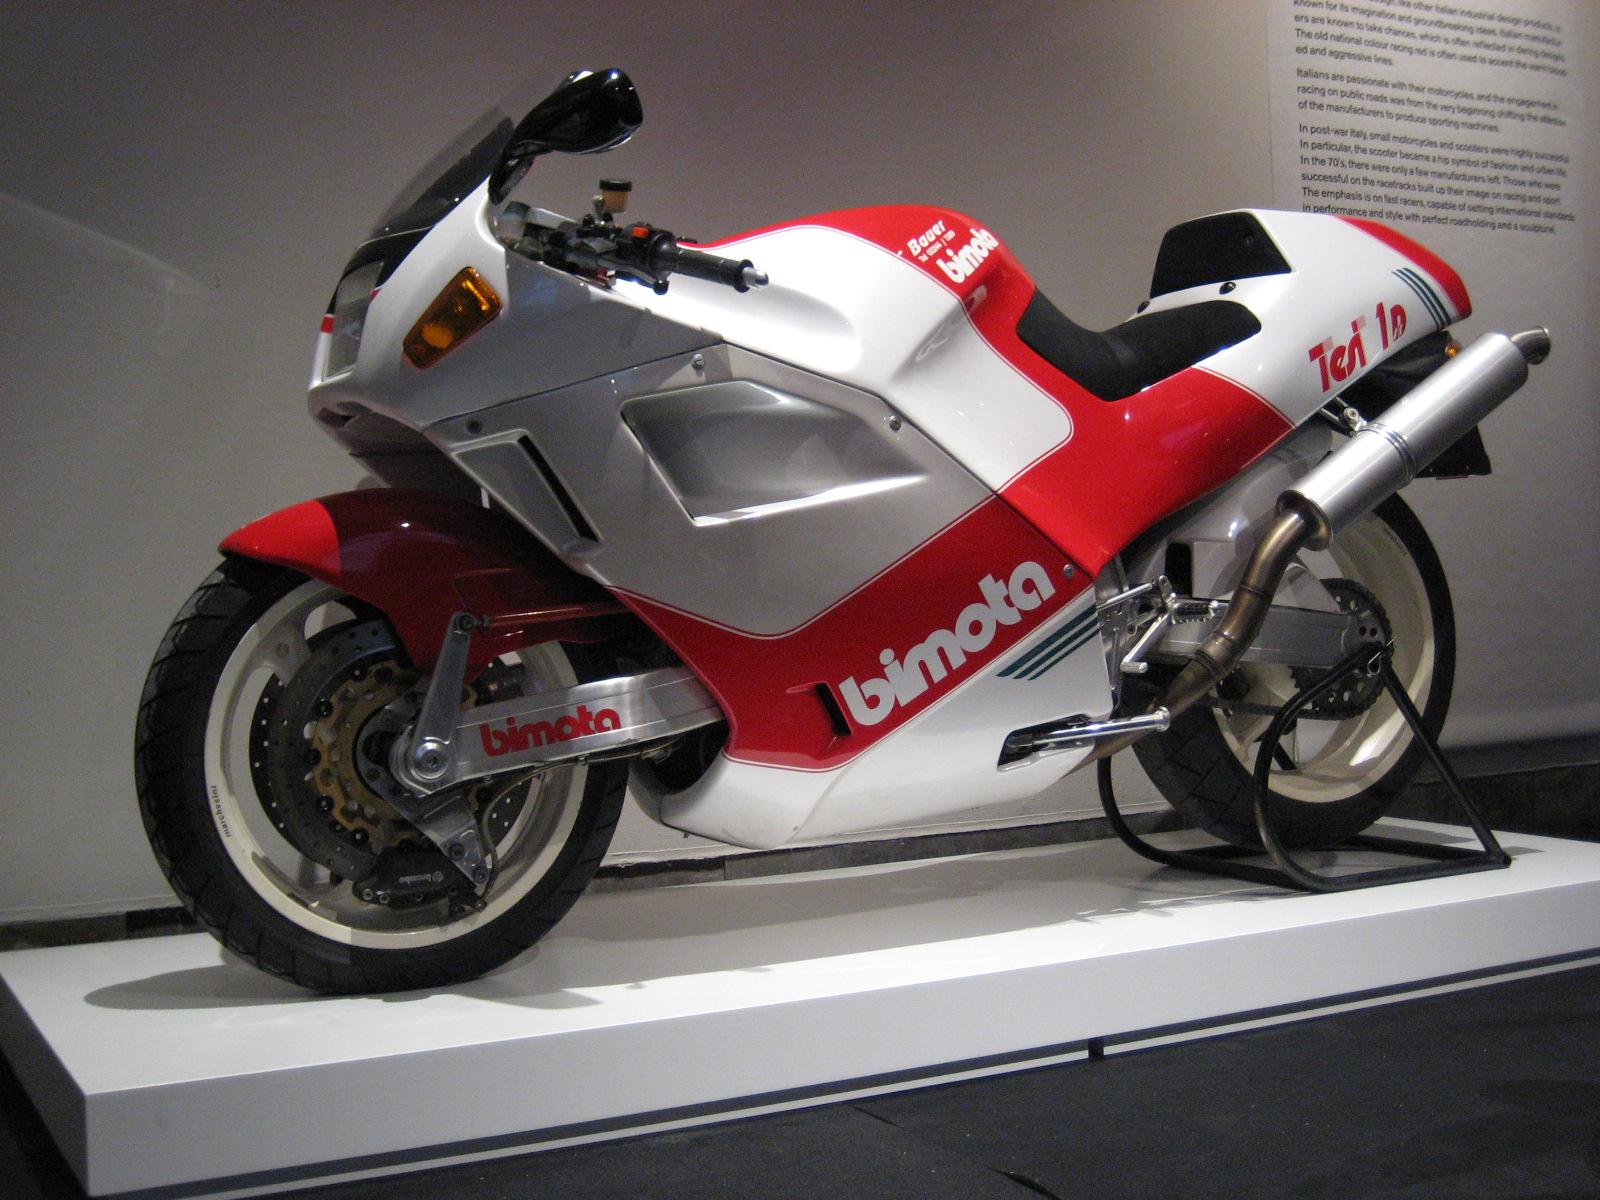 K Ducati Wallpaper